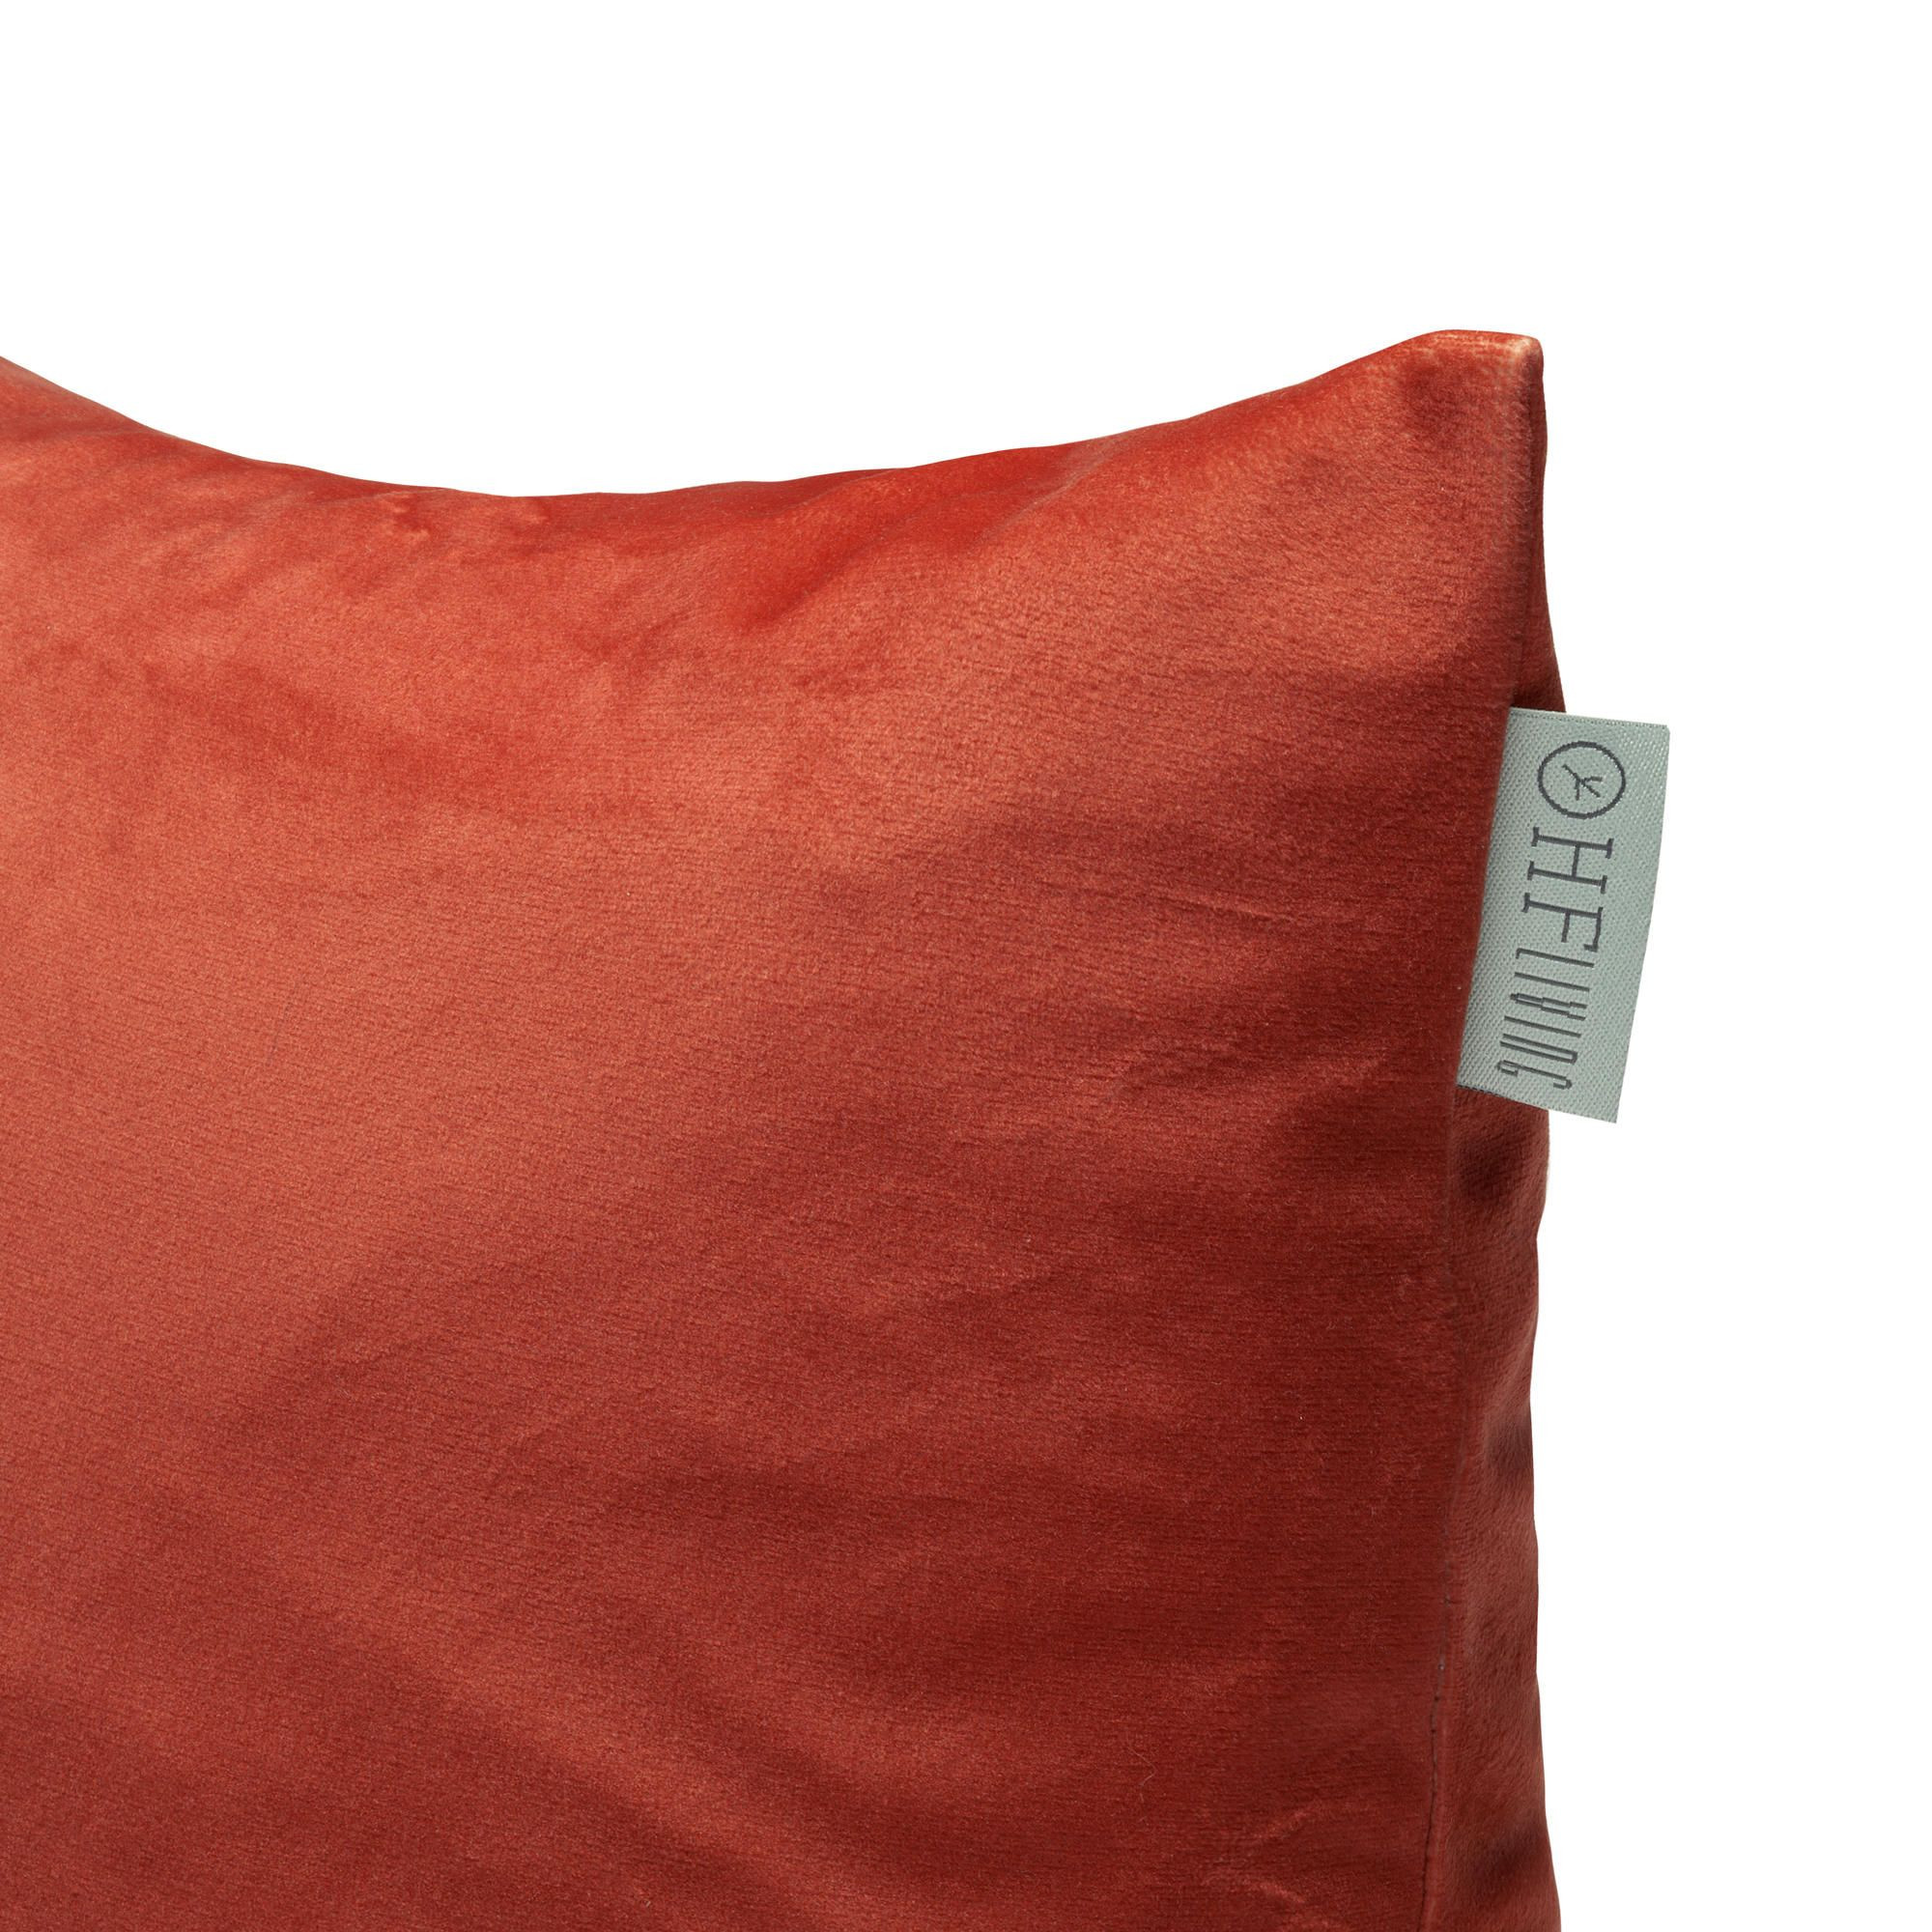 Kussensloop Fluweel Oranje | 100% Polyester